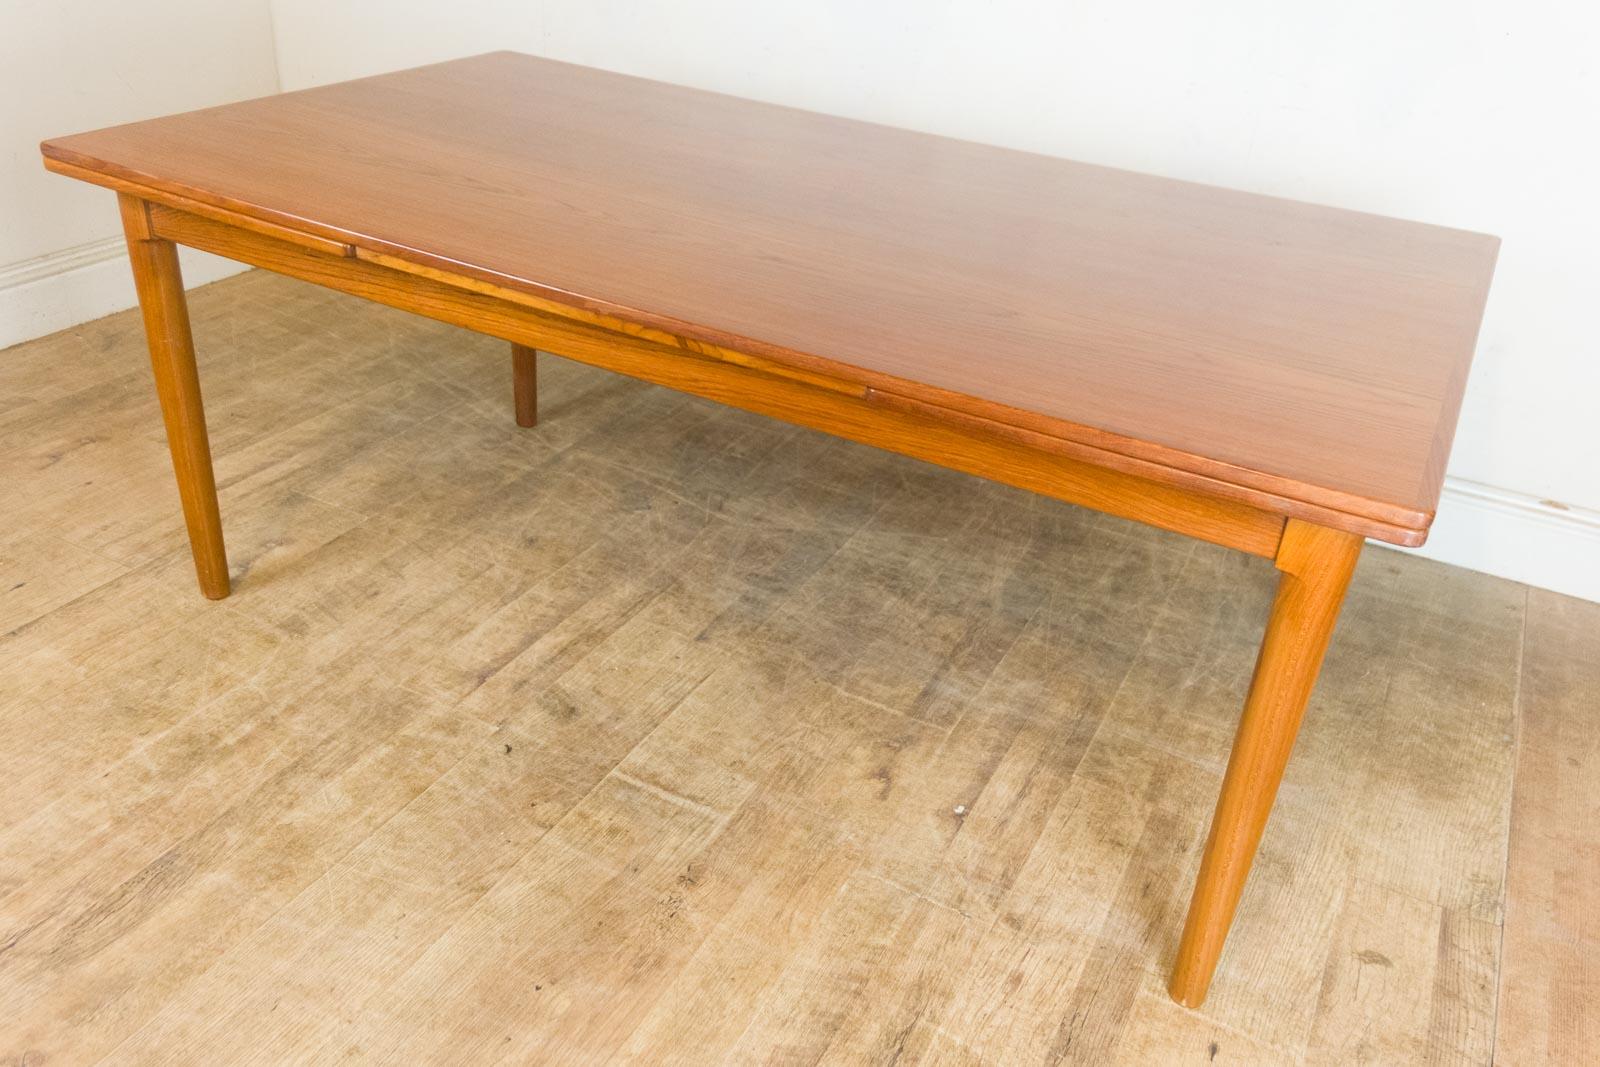 Vintage Retro Large Teak Danish Extending Dining Table eBay : HV011007 3 from www.ebay.co.uk size 1600 x 1067 jpeg 220kB